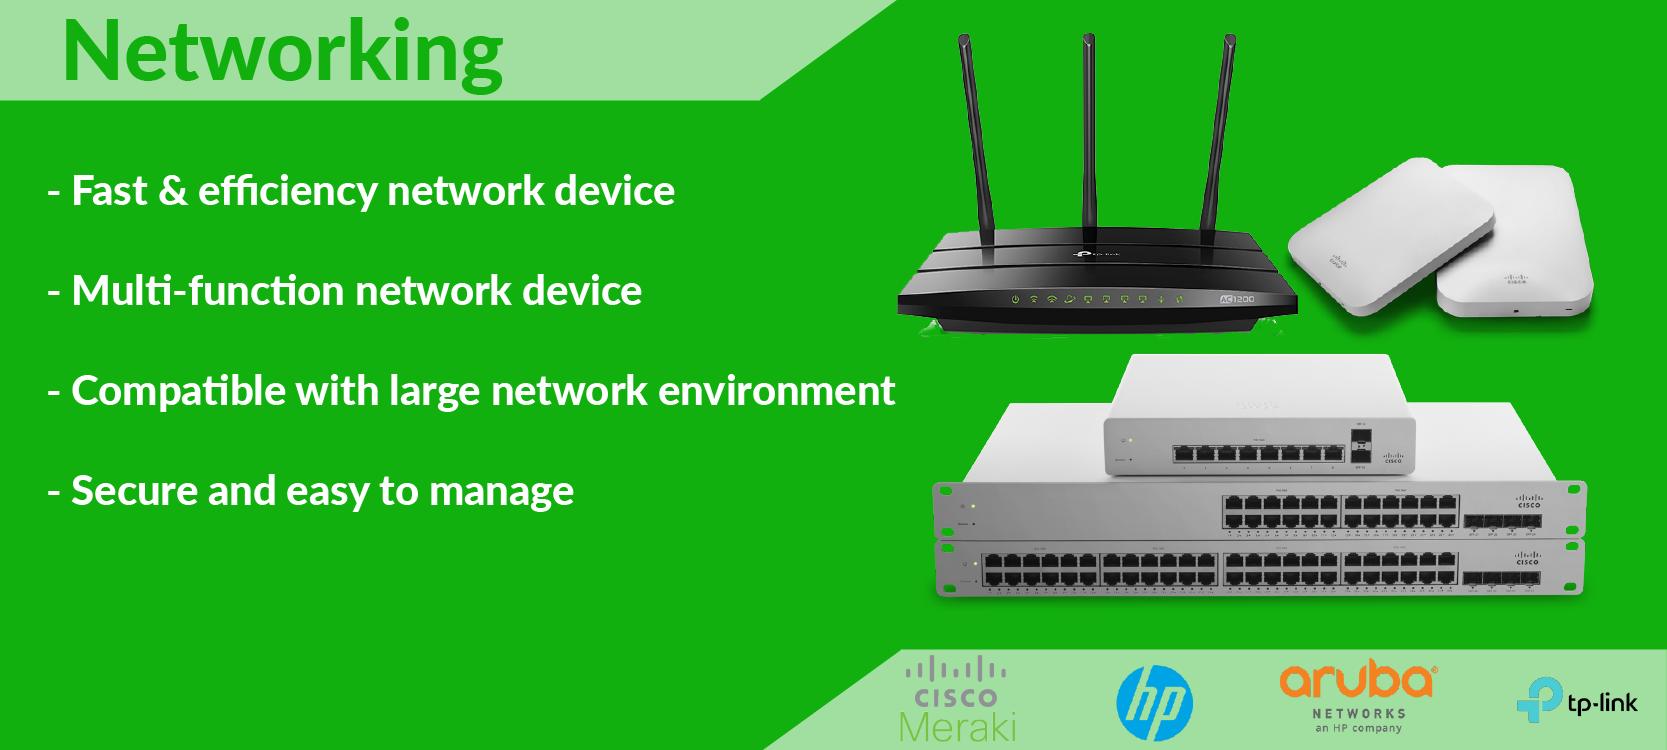 Networking v1